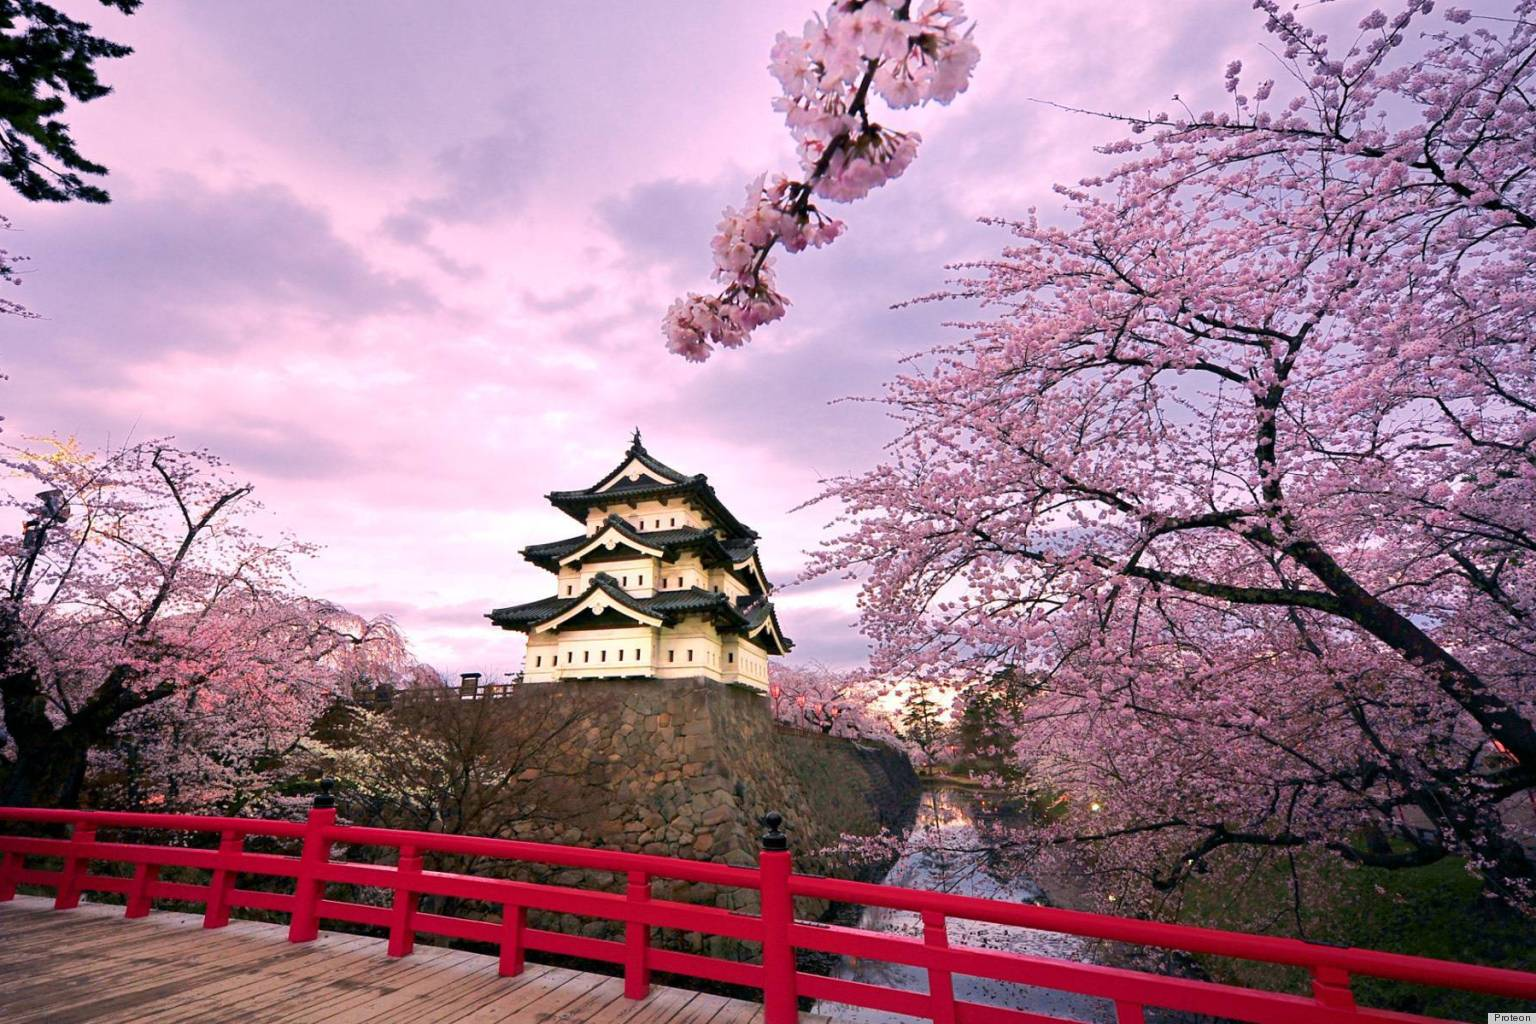 o-CHERRY-BLOSSOM-TREE-JAPAN-facebook.jpg